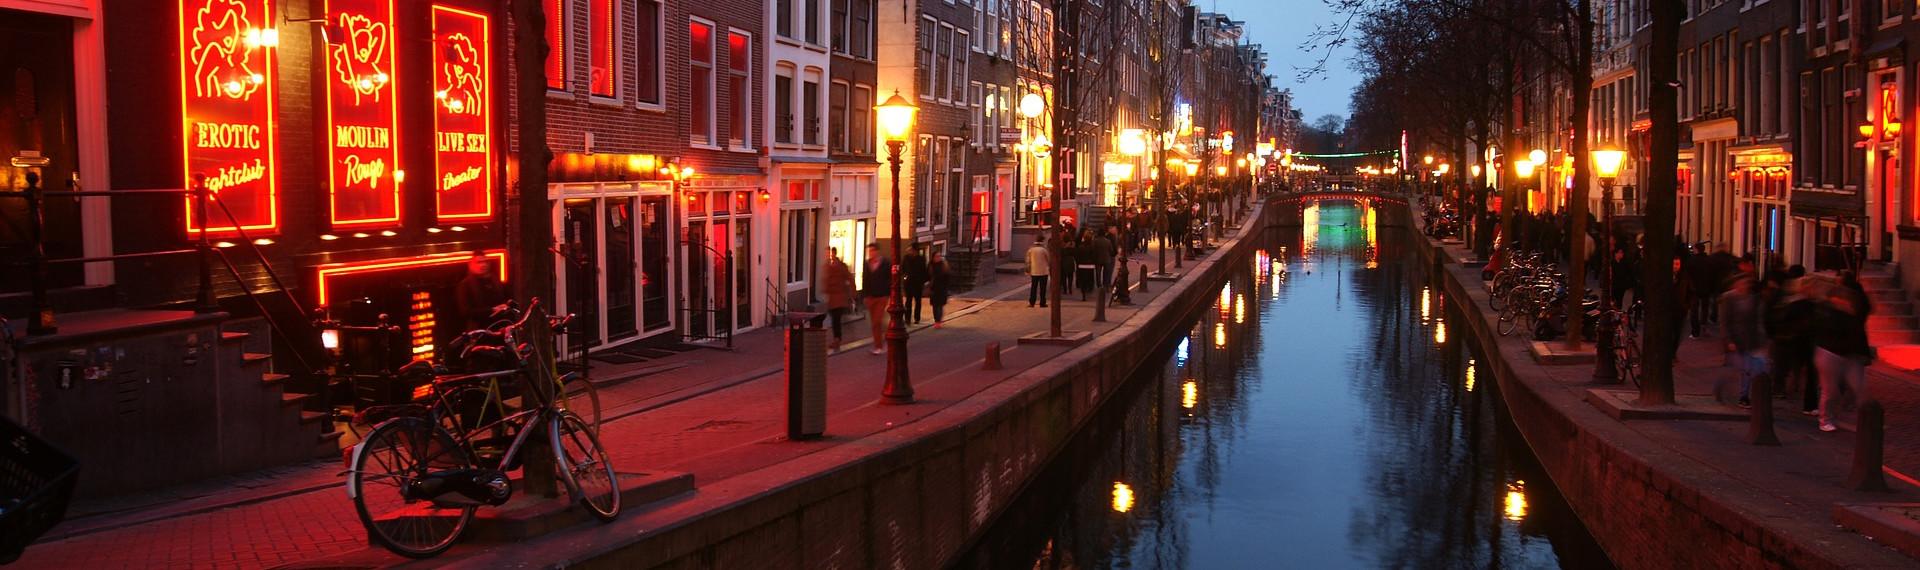 Pubcrawl i Red Light District Amsterdam